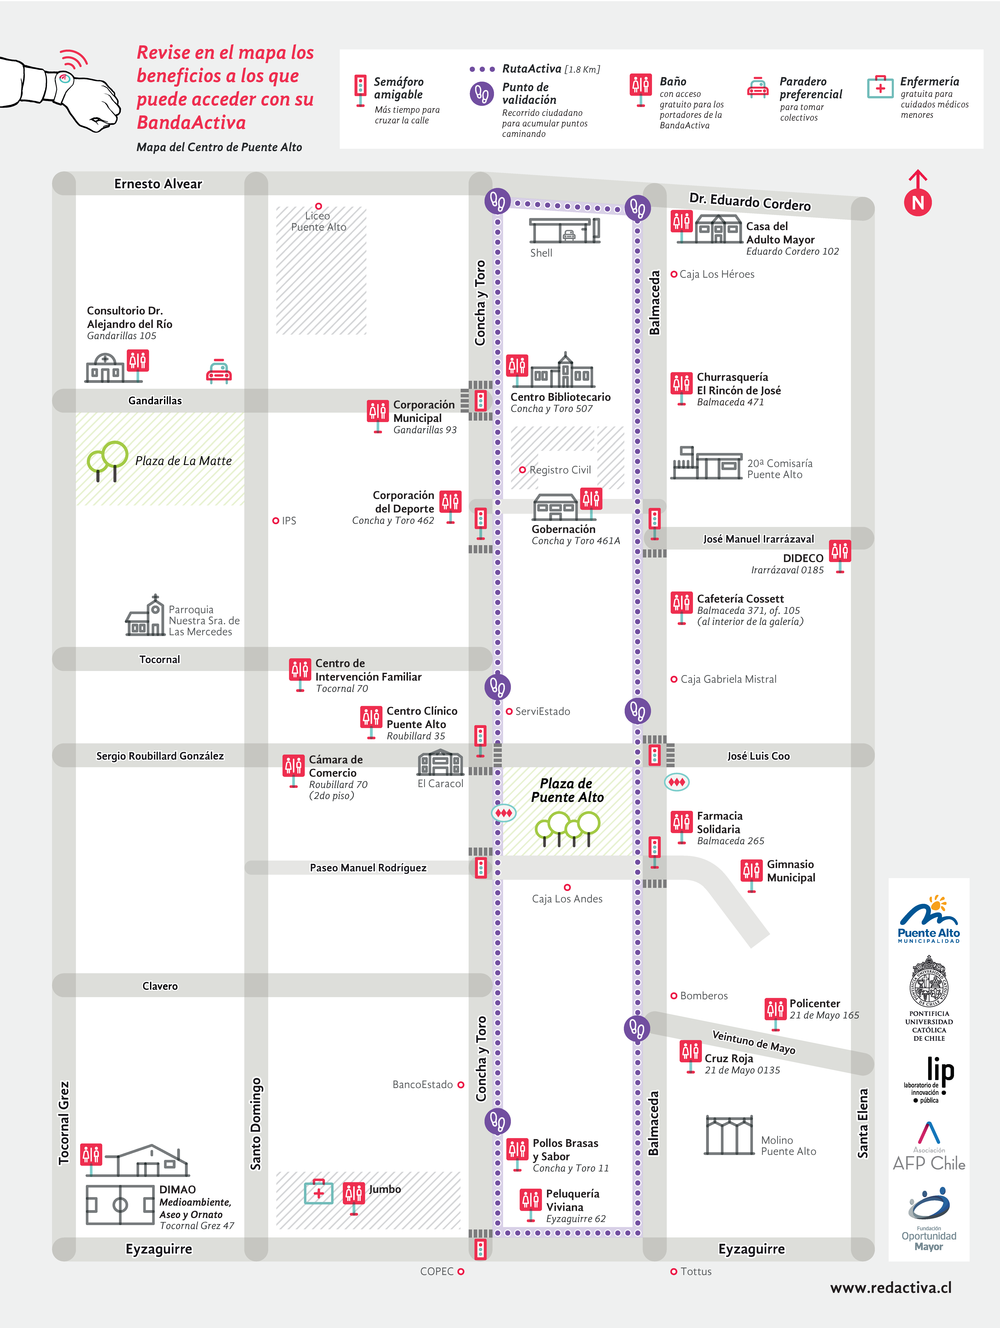 Mapa_redactiva.png